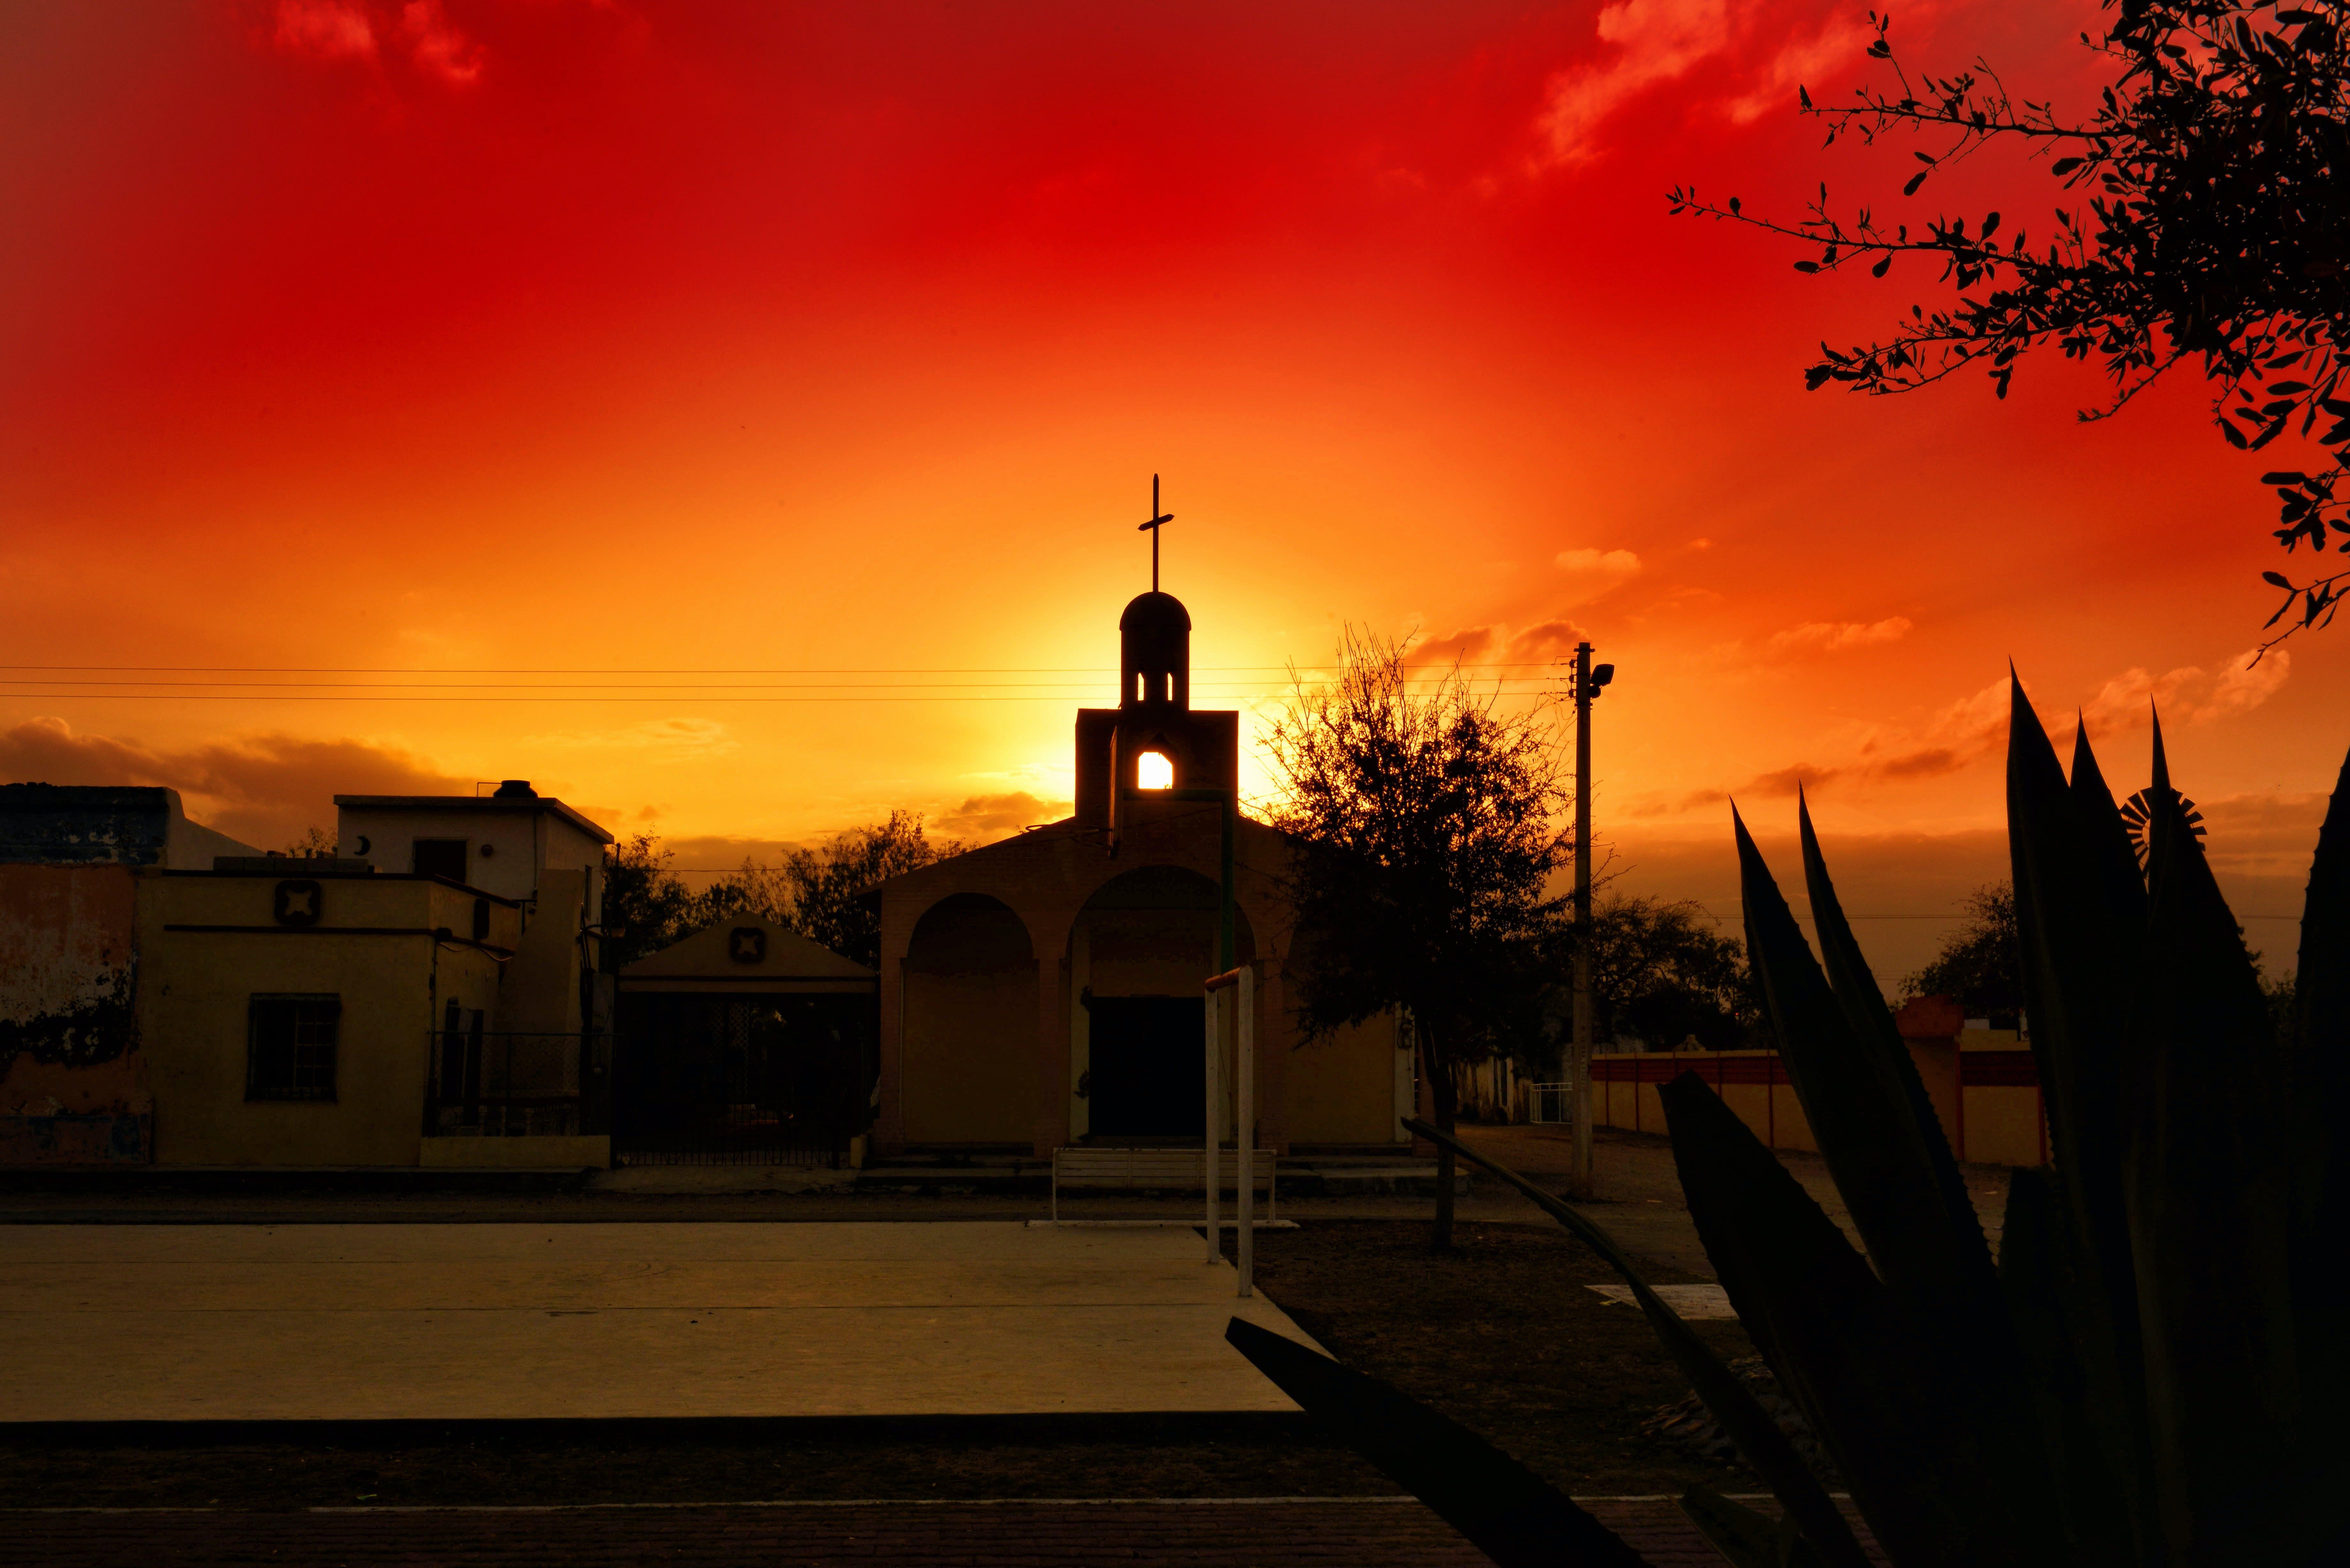 architecture, building, catholic